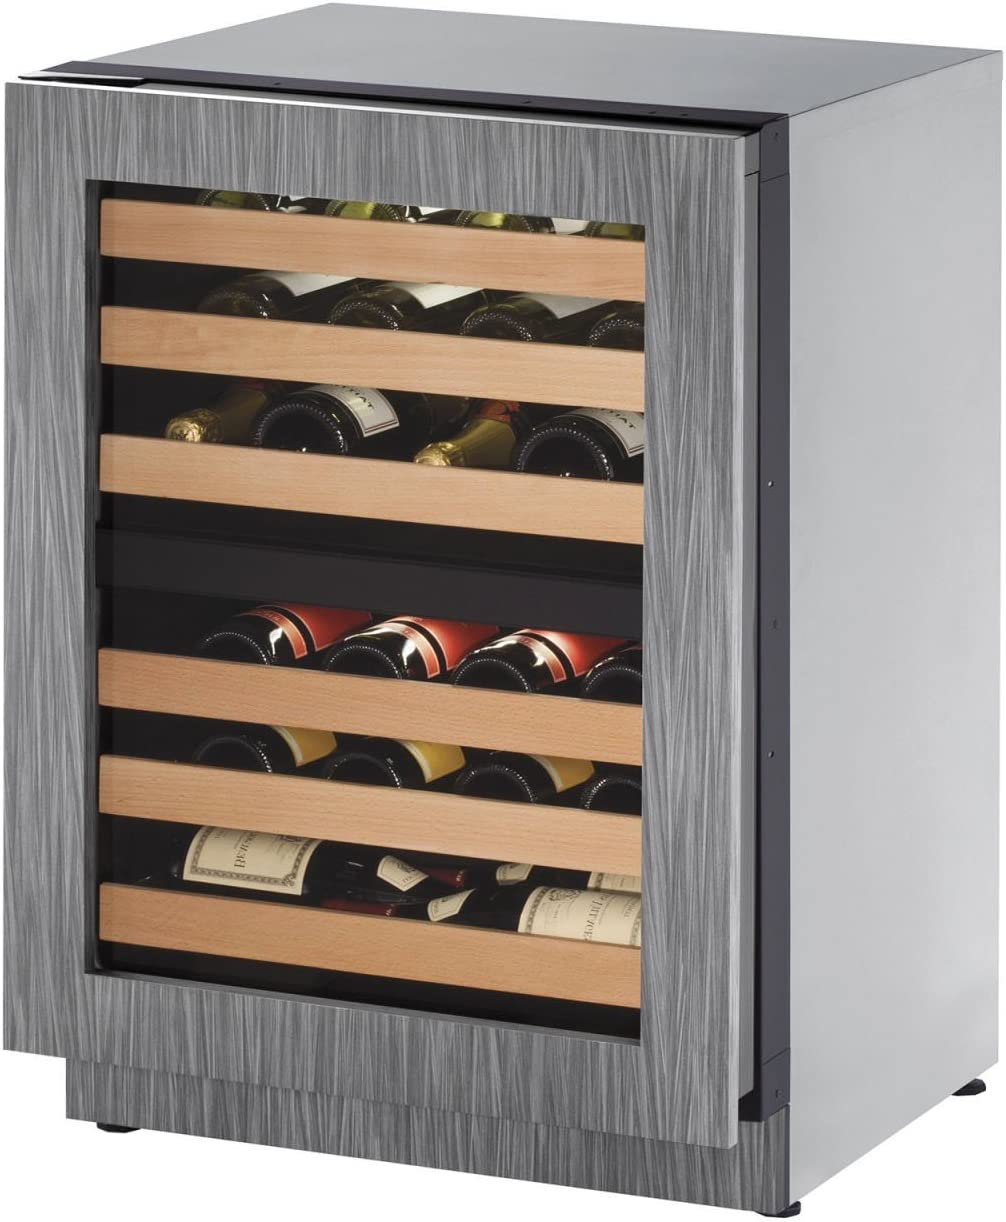 U-Line U2224ZWCINT01A Built-in Wine Storage Stee Discount mail order 24